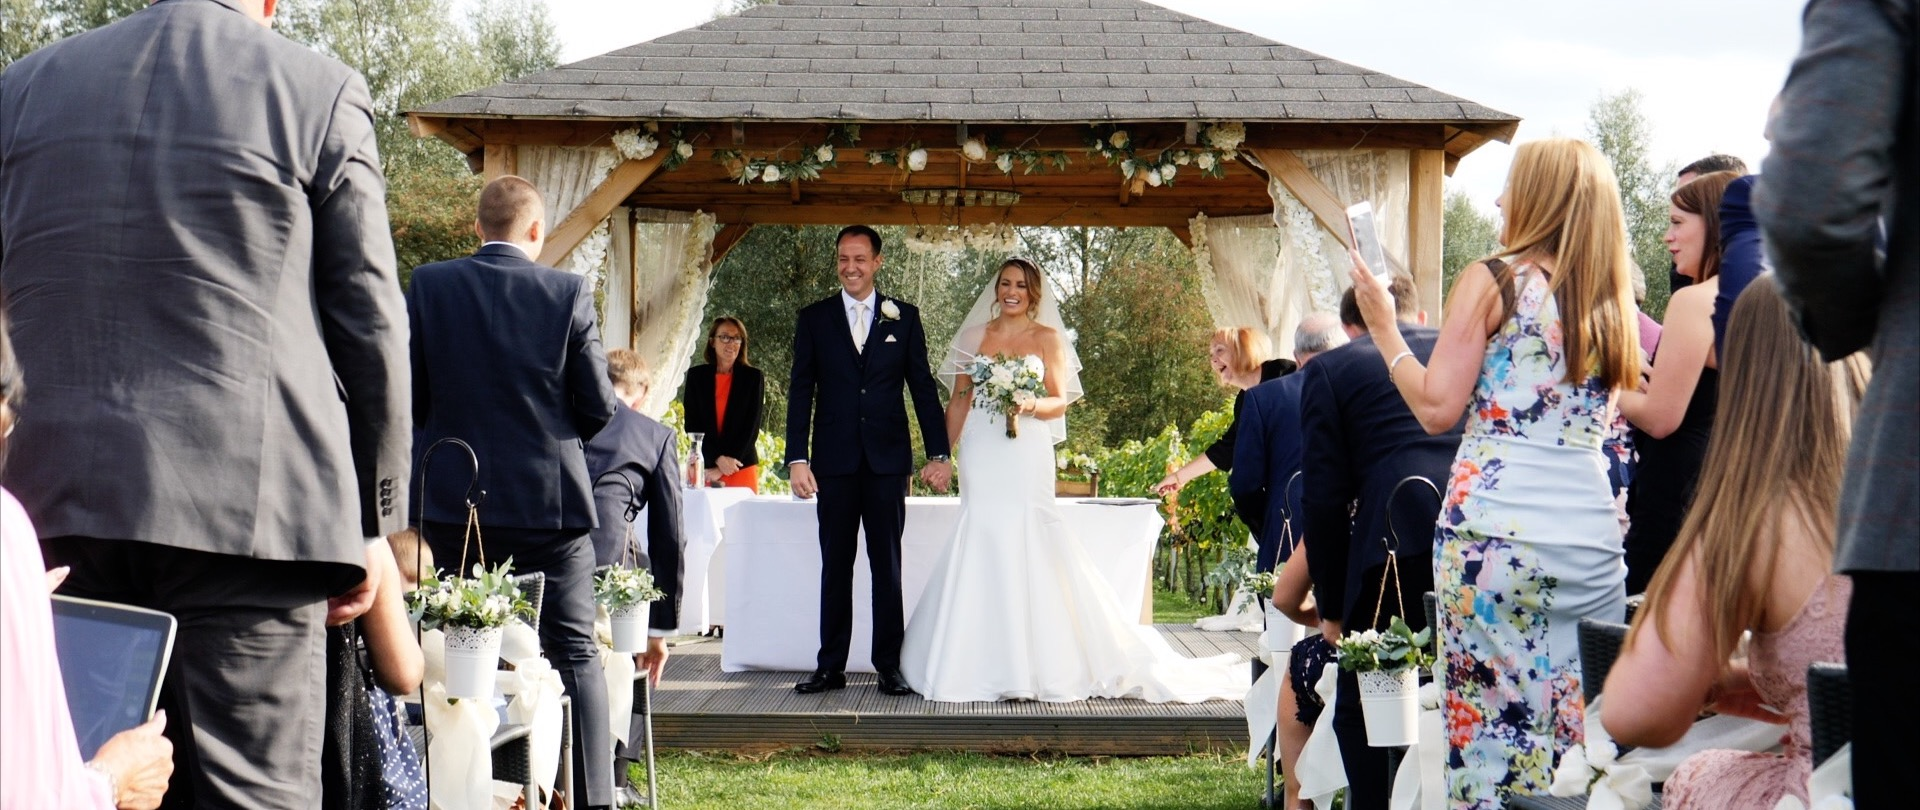 West Street Vineyard Wedding Ceremony.jpg